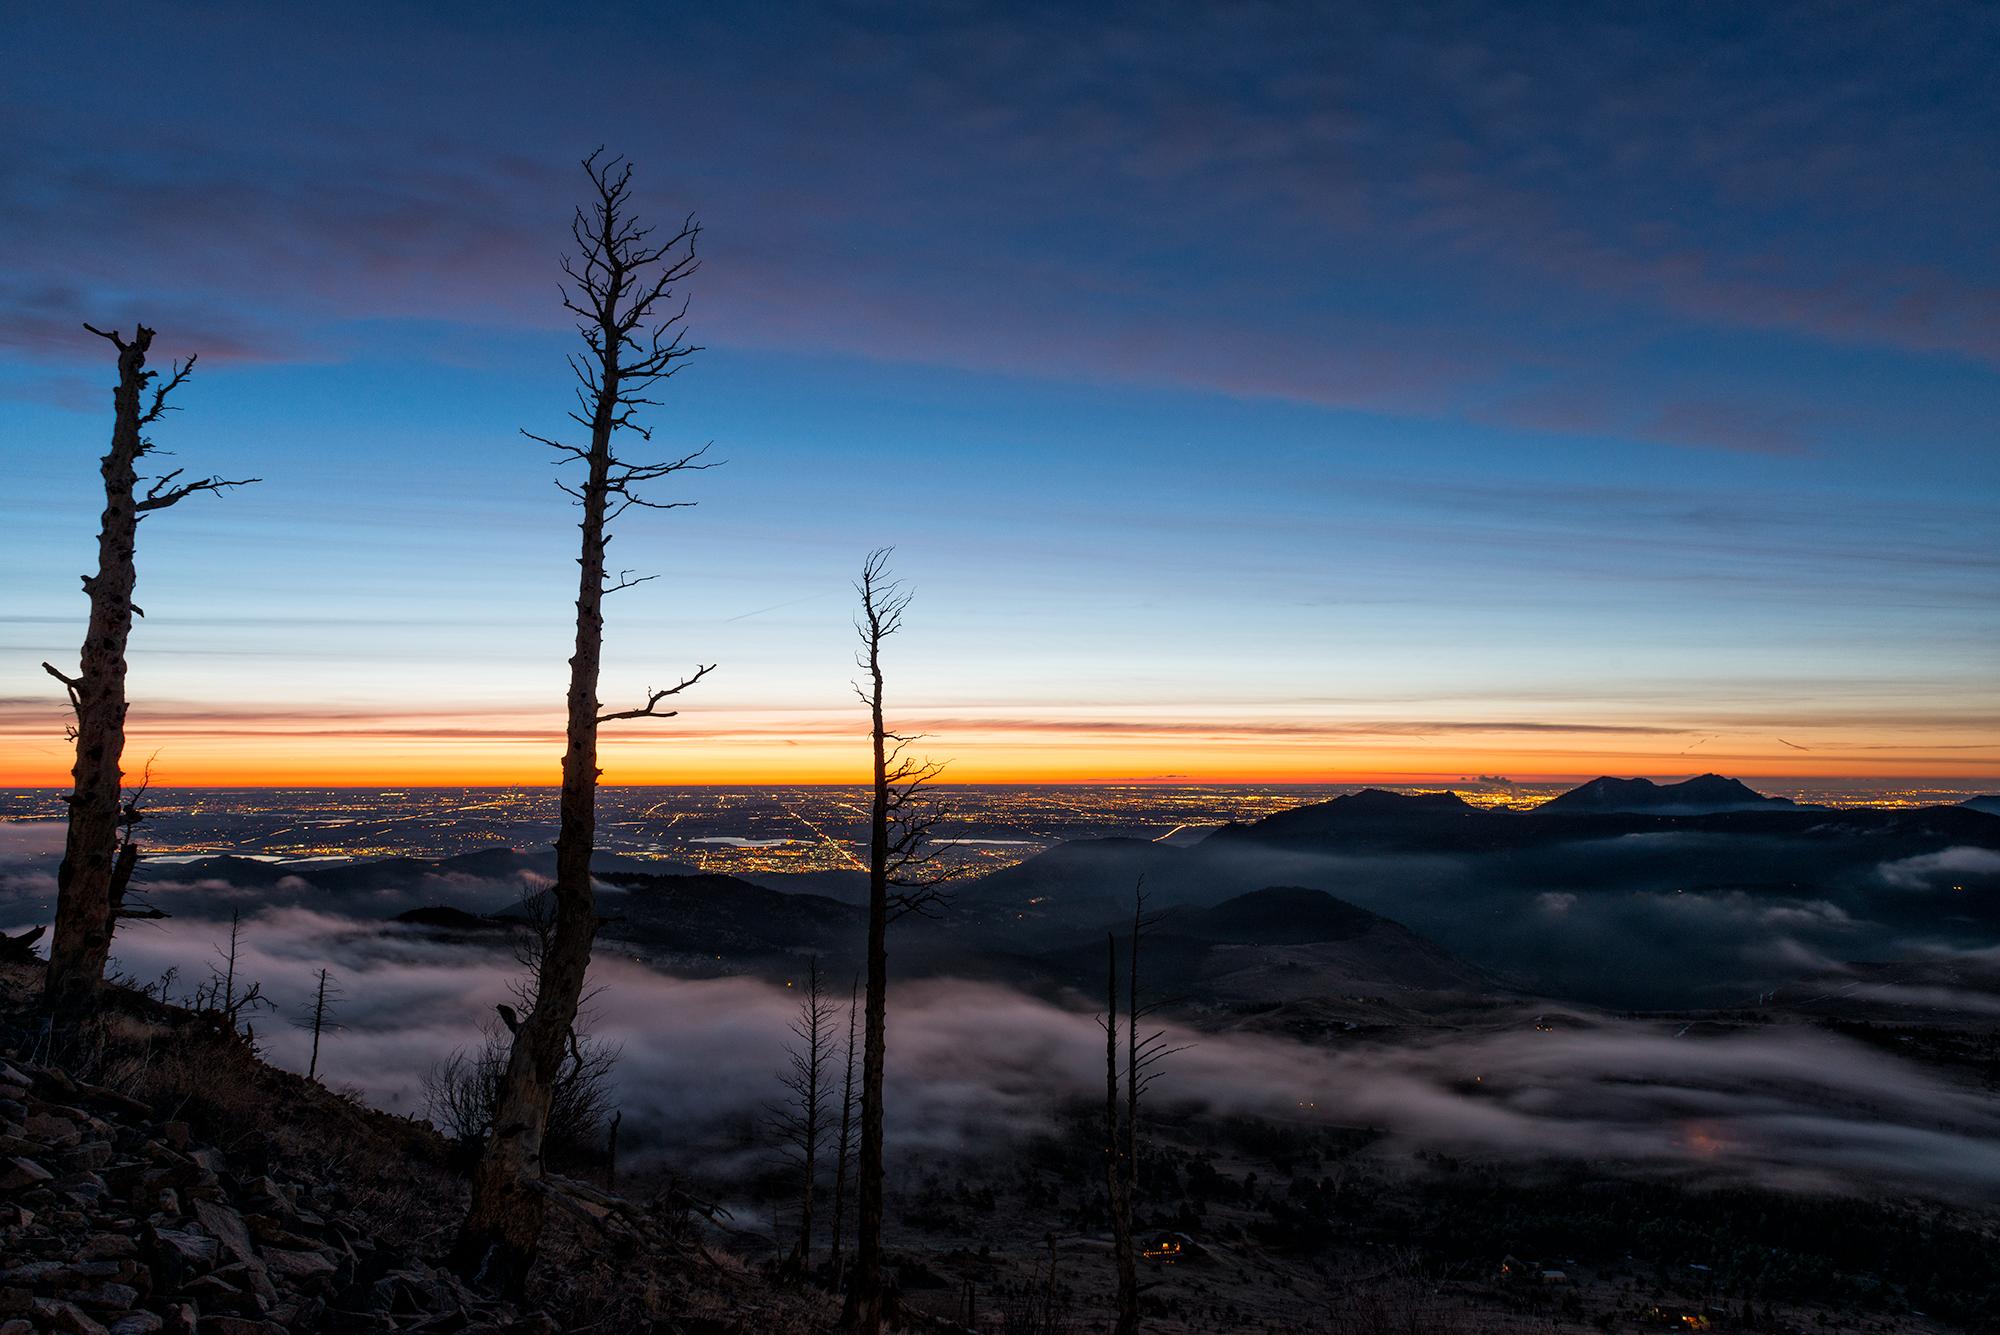 Sugarloaf, #1. Sugarloaf Mountain, Colorado, 2017